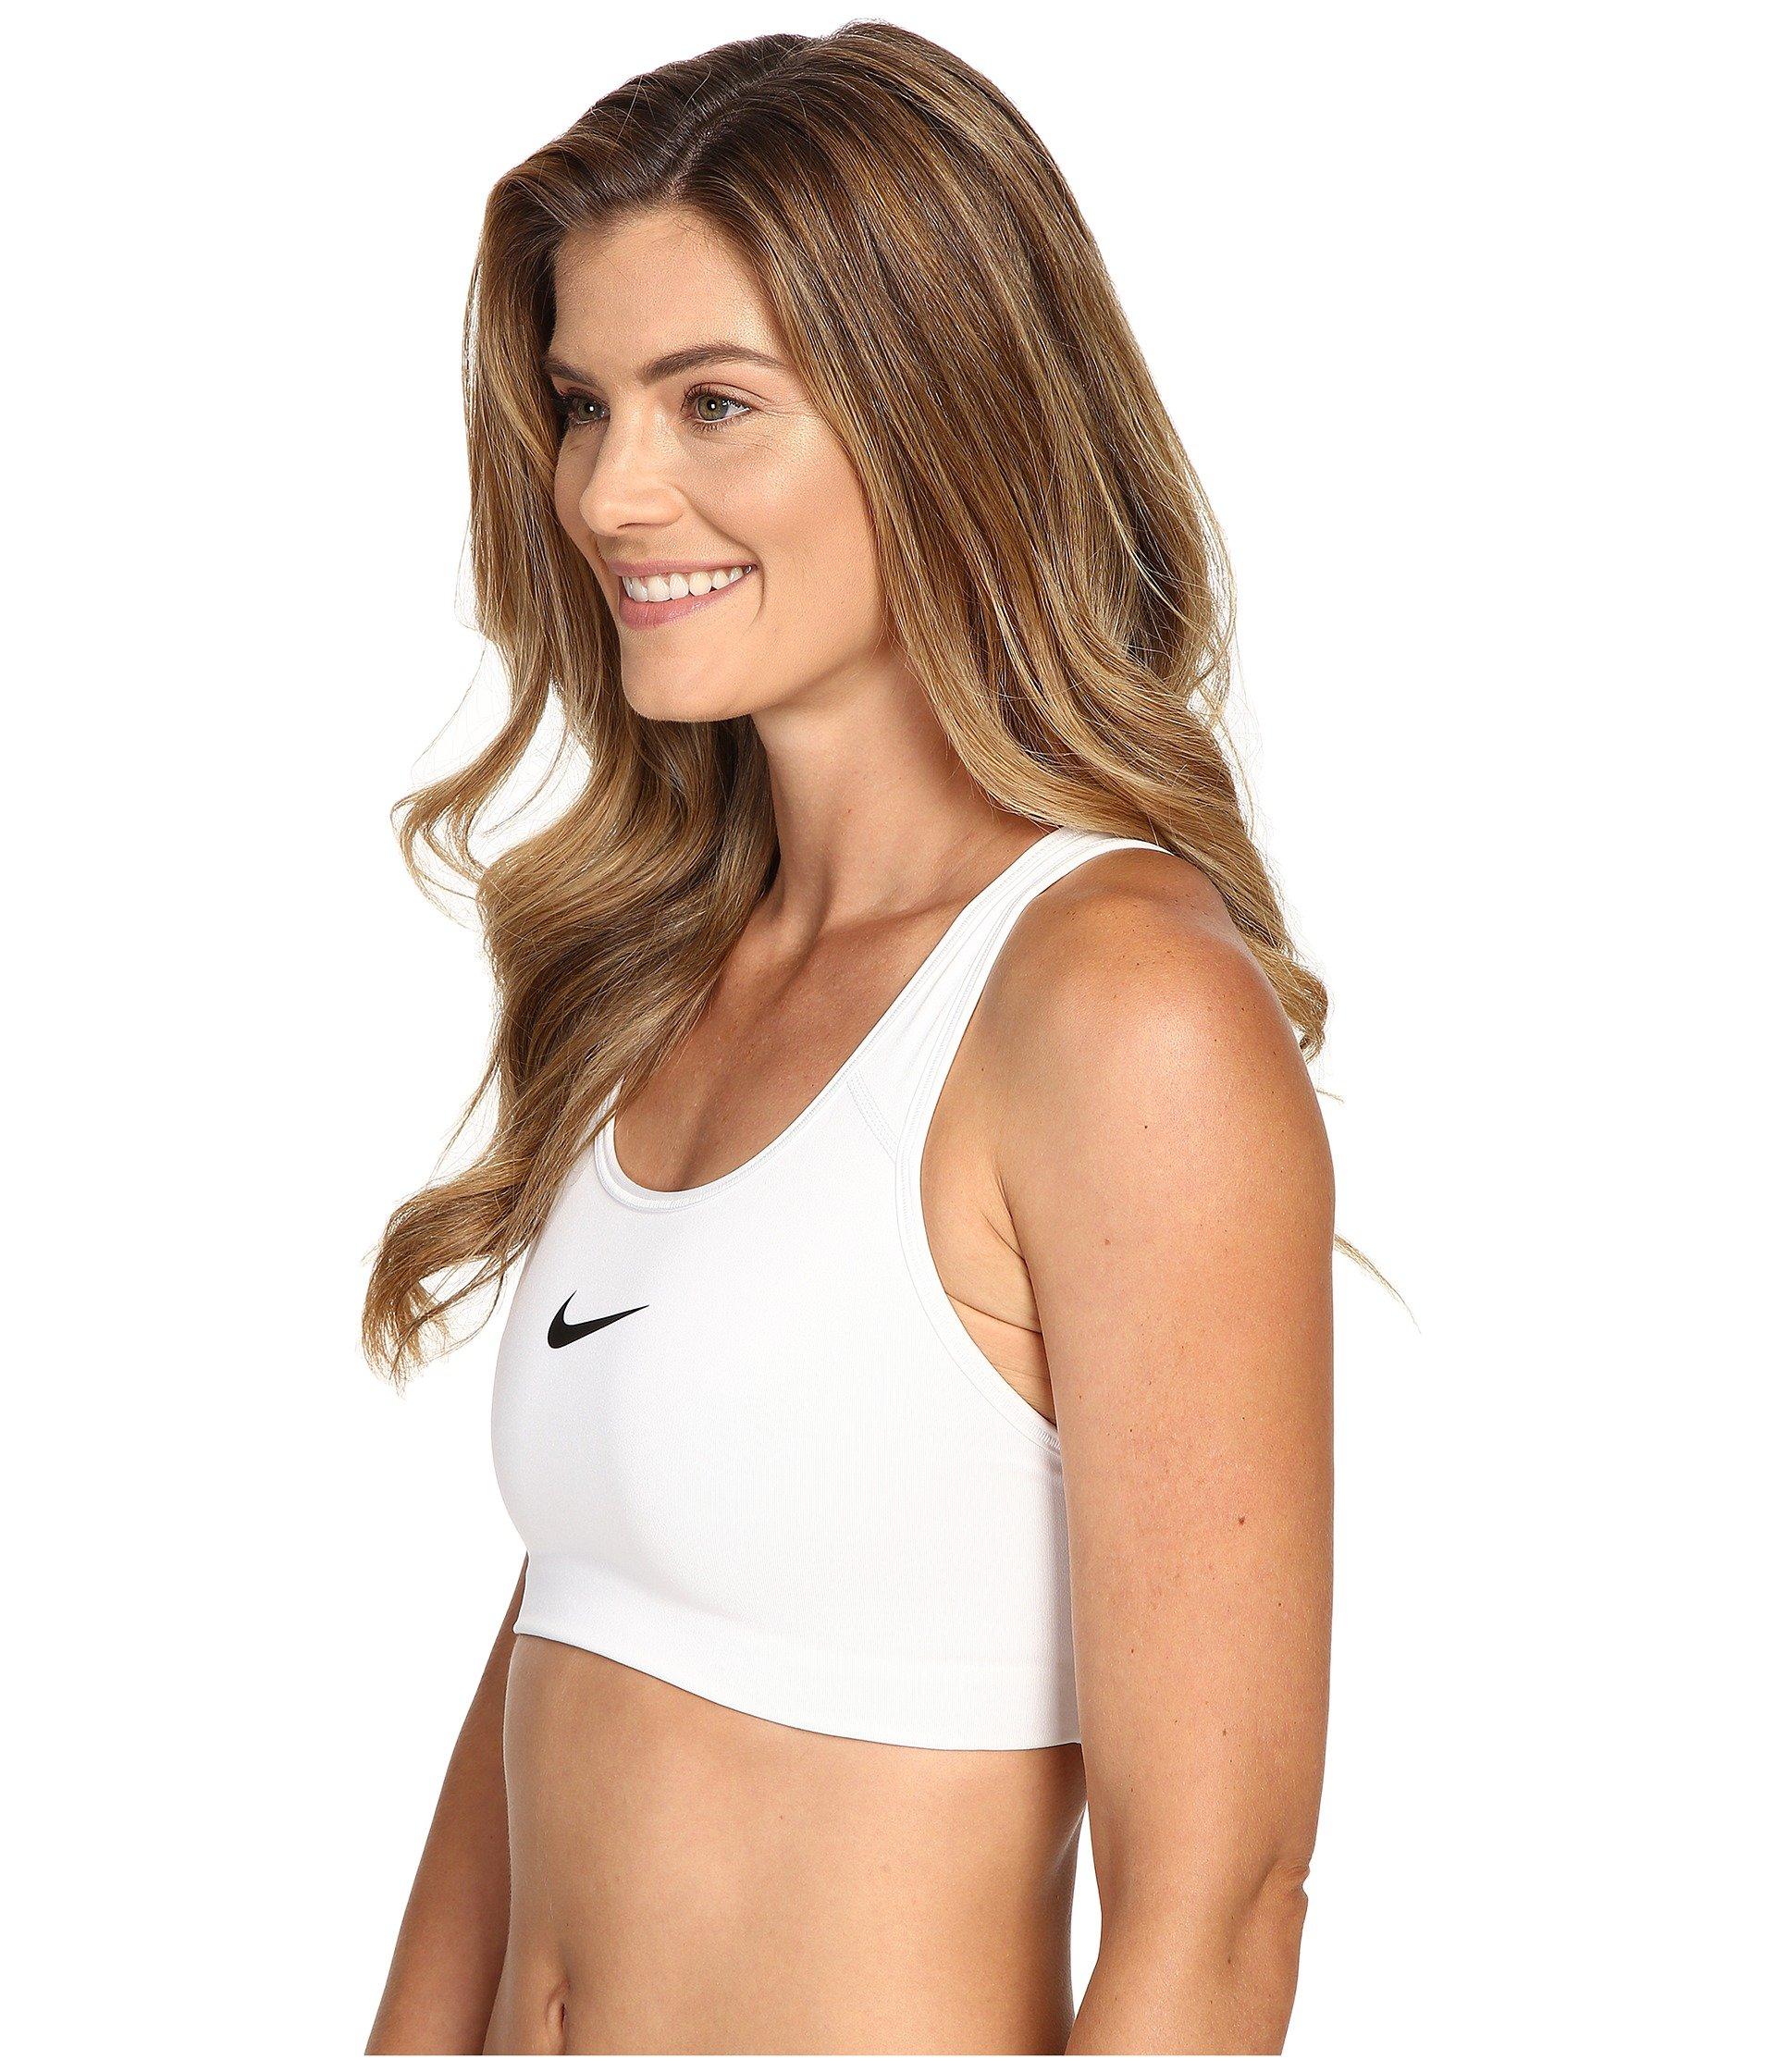 NIKE Women's Swoosh Sports Bra, White/Black, X-Small by Nike (Image #2)